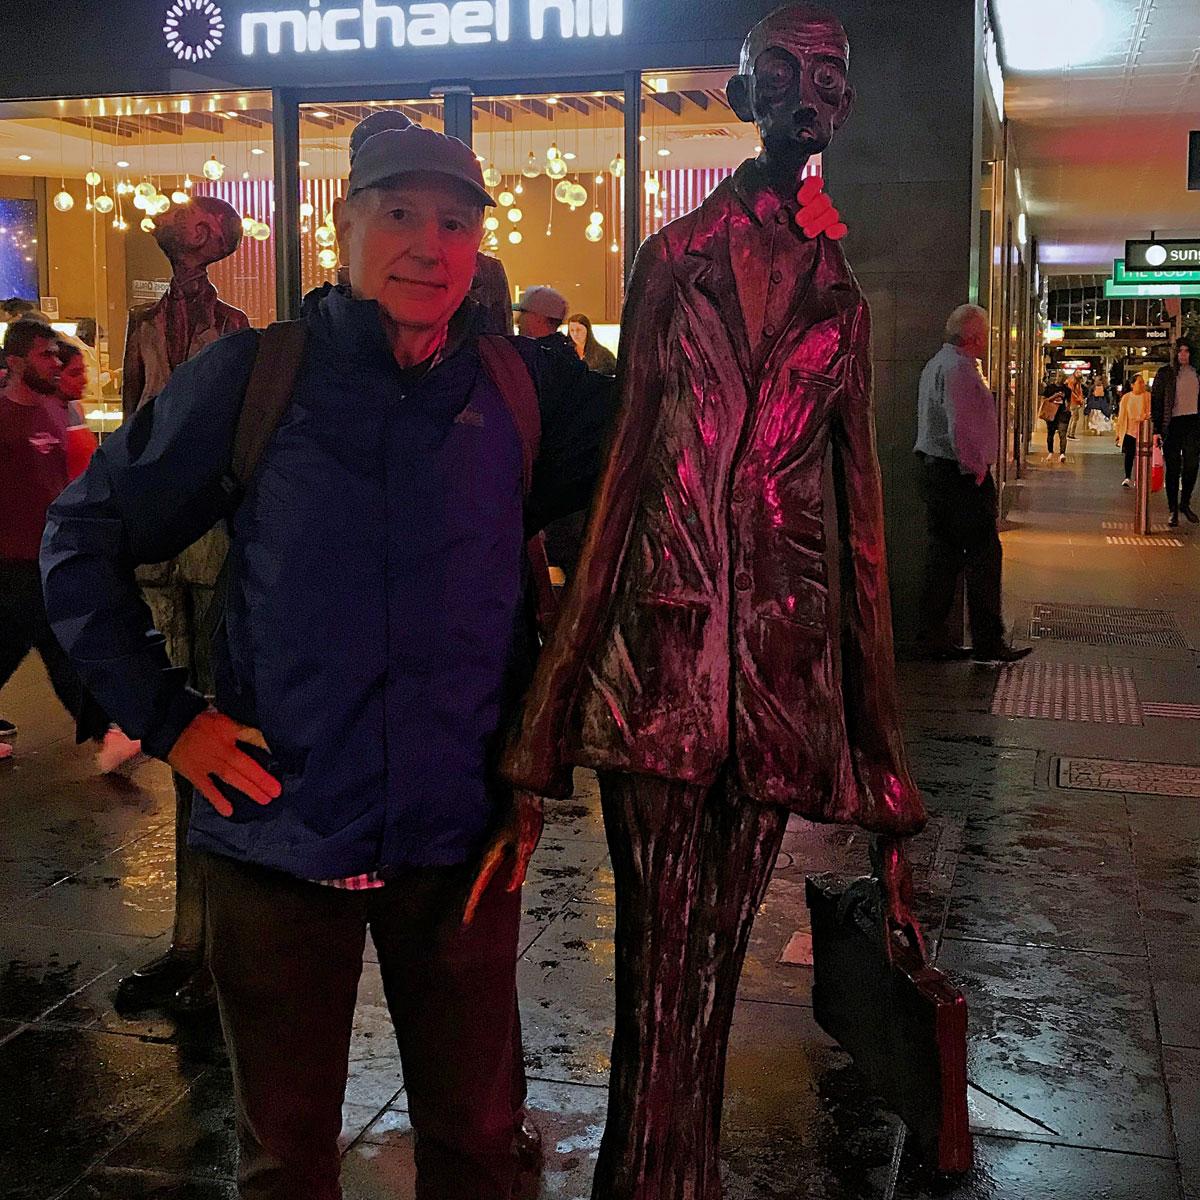 Swanson Street Business people Statues